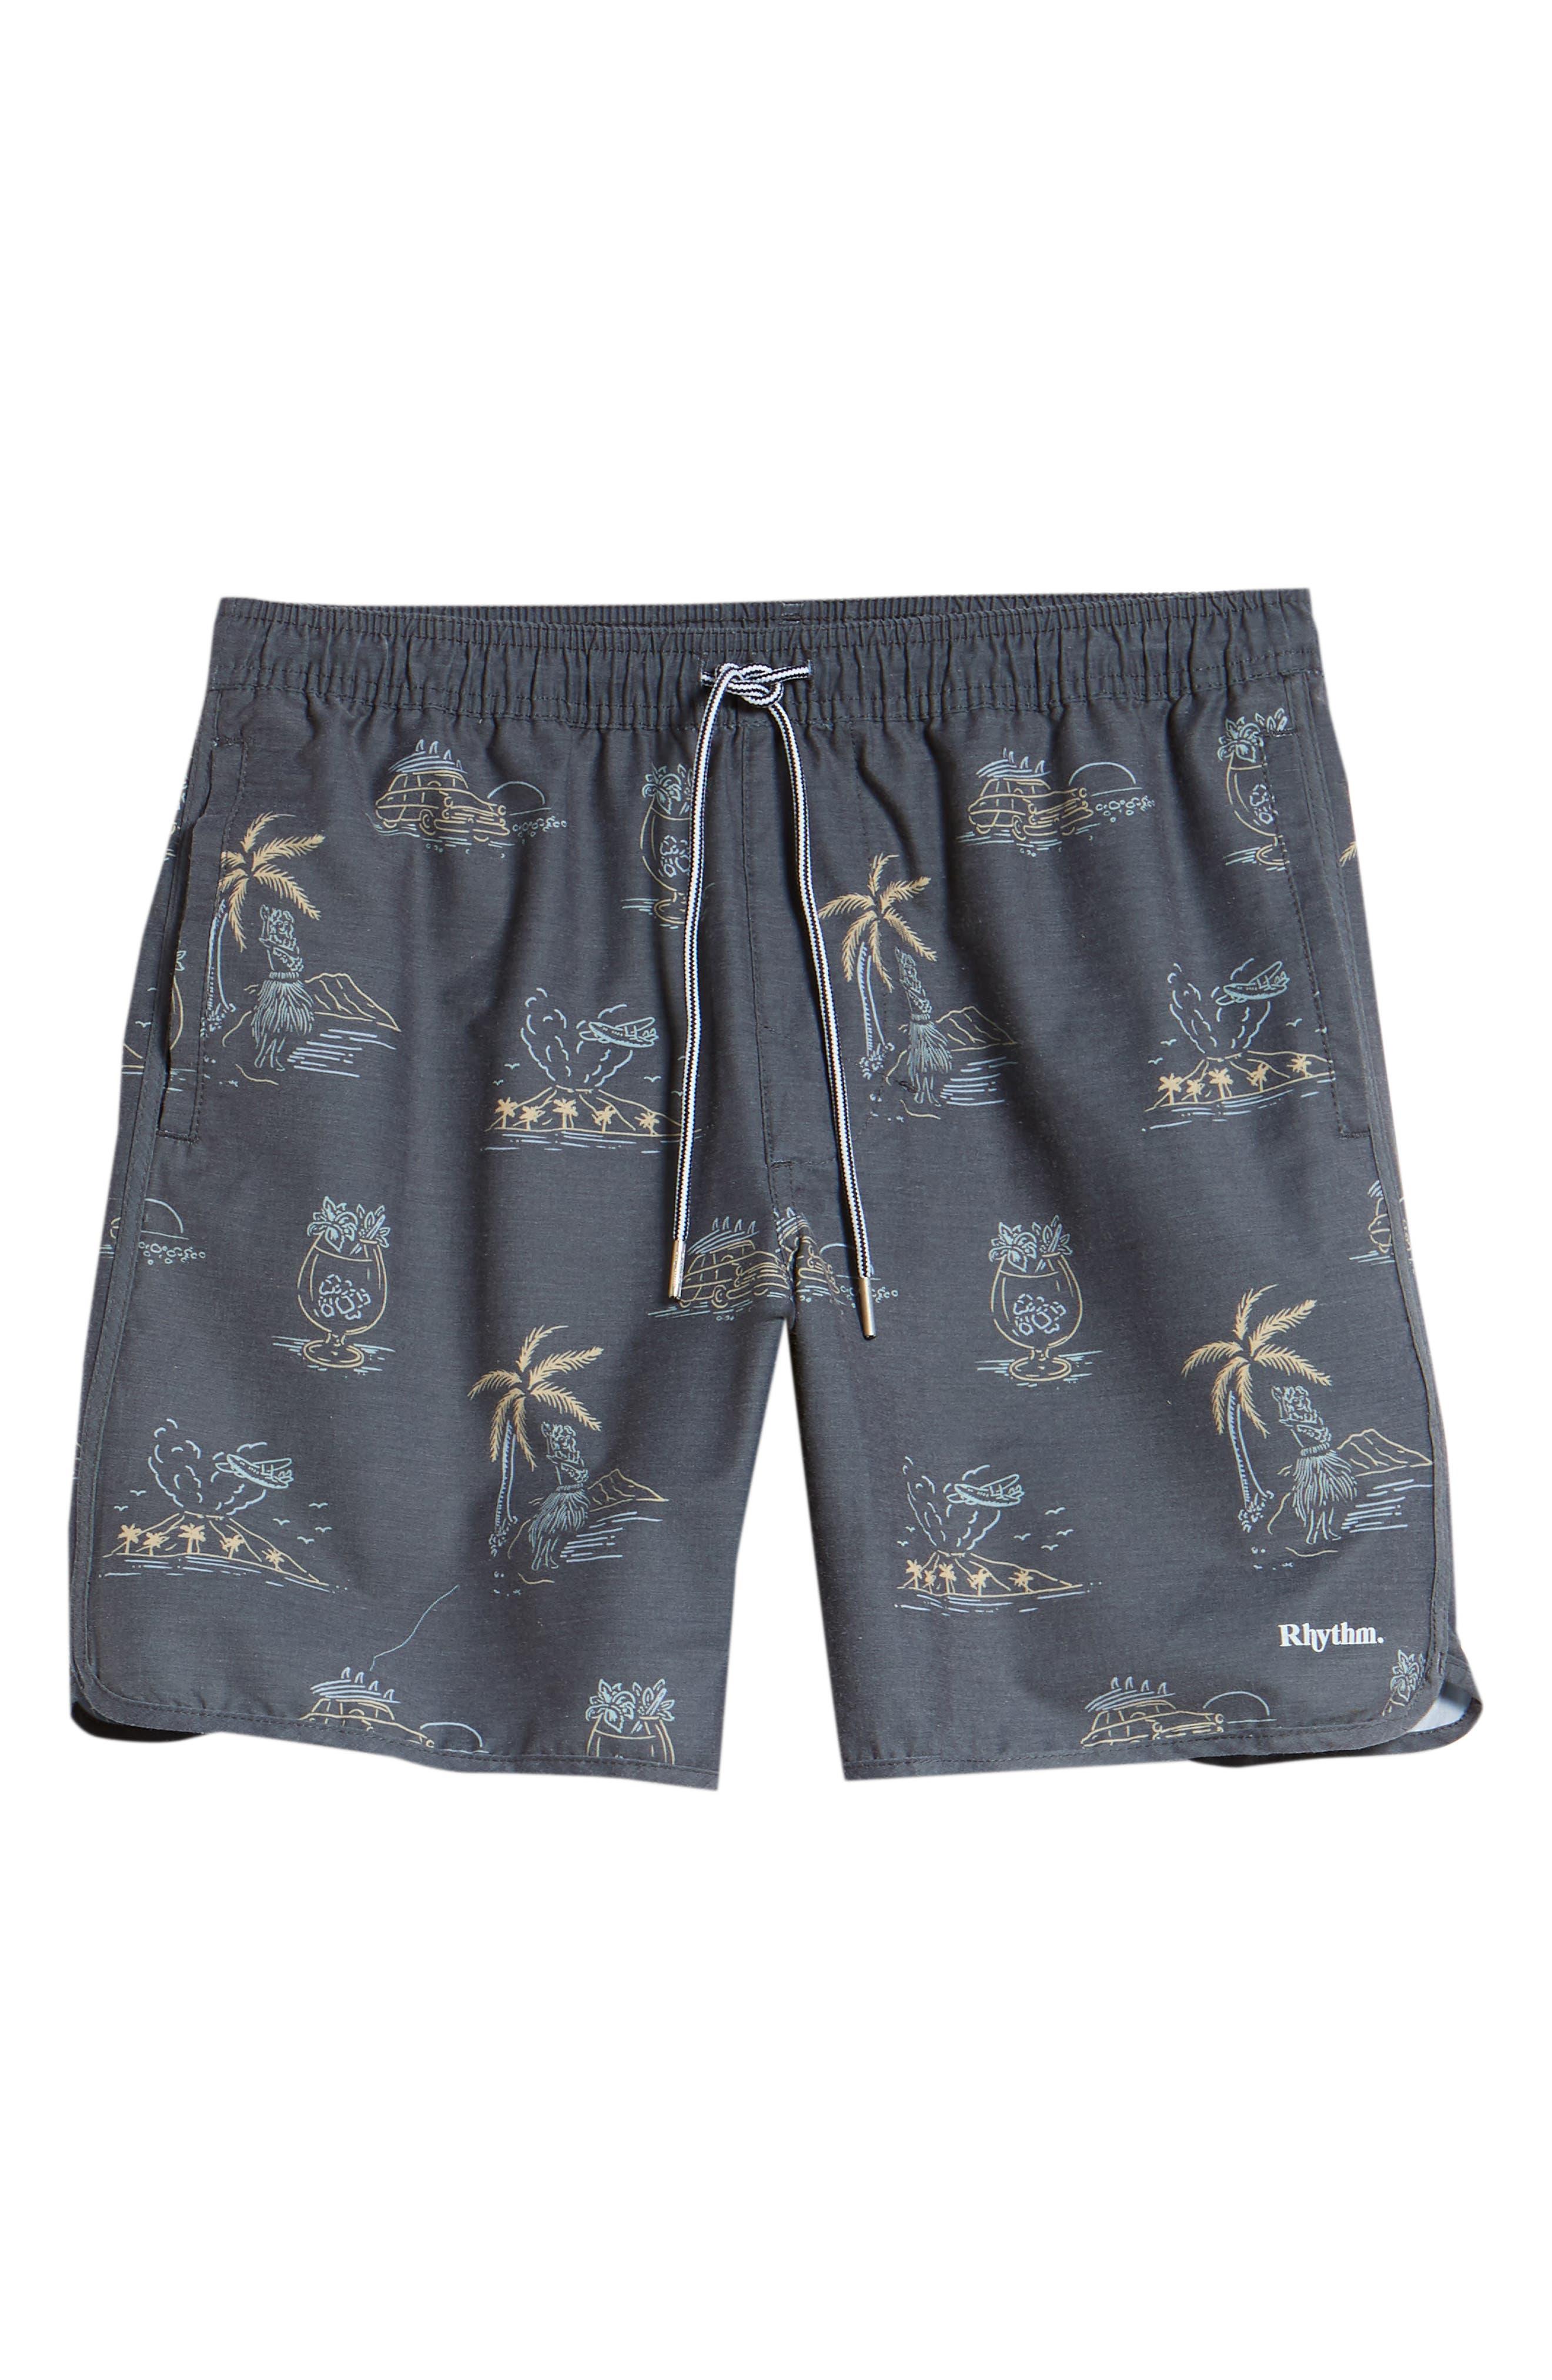 Maui Beach Swim Trunks,                             Alternate thumbnail 6, color,                             VINTAGE BLACK